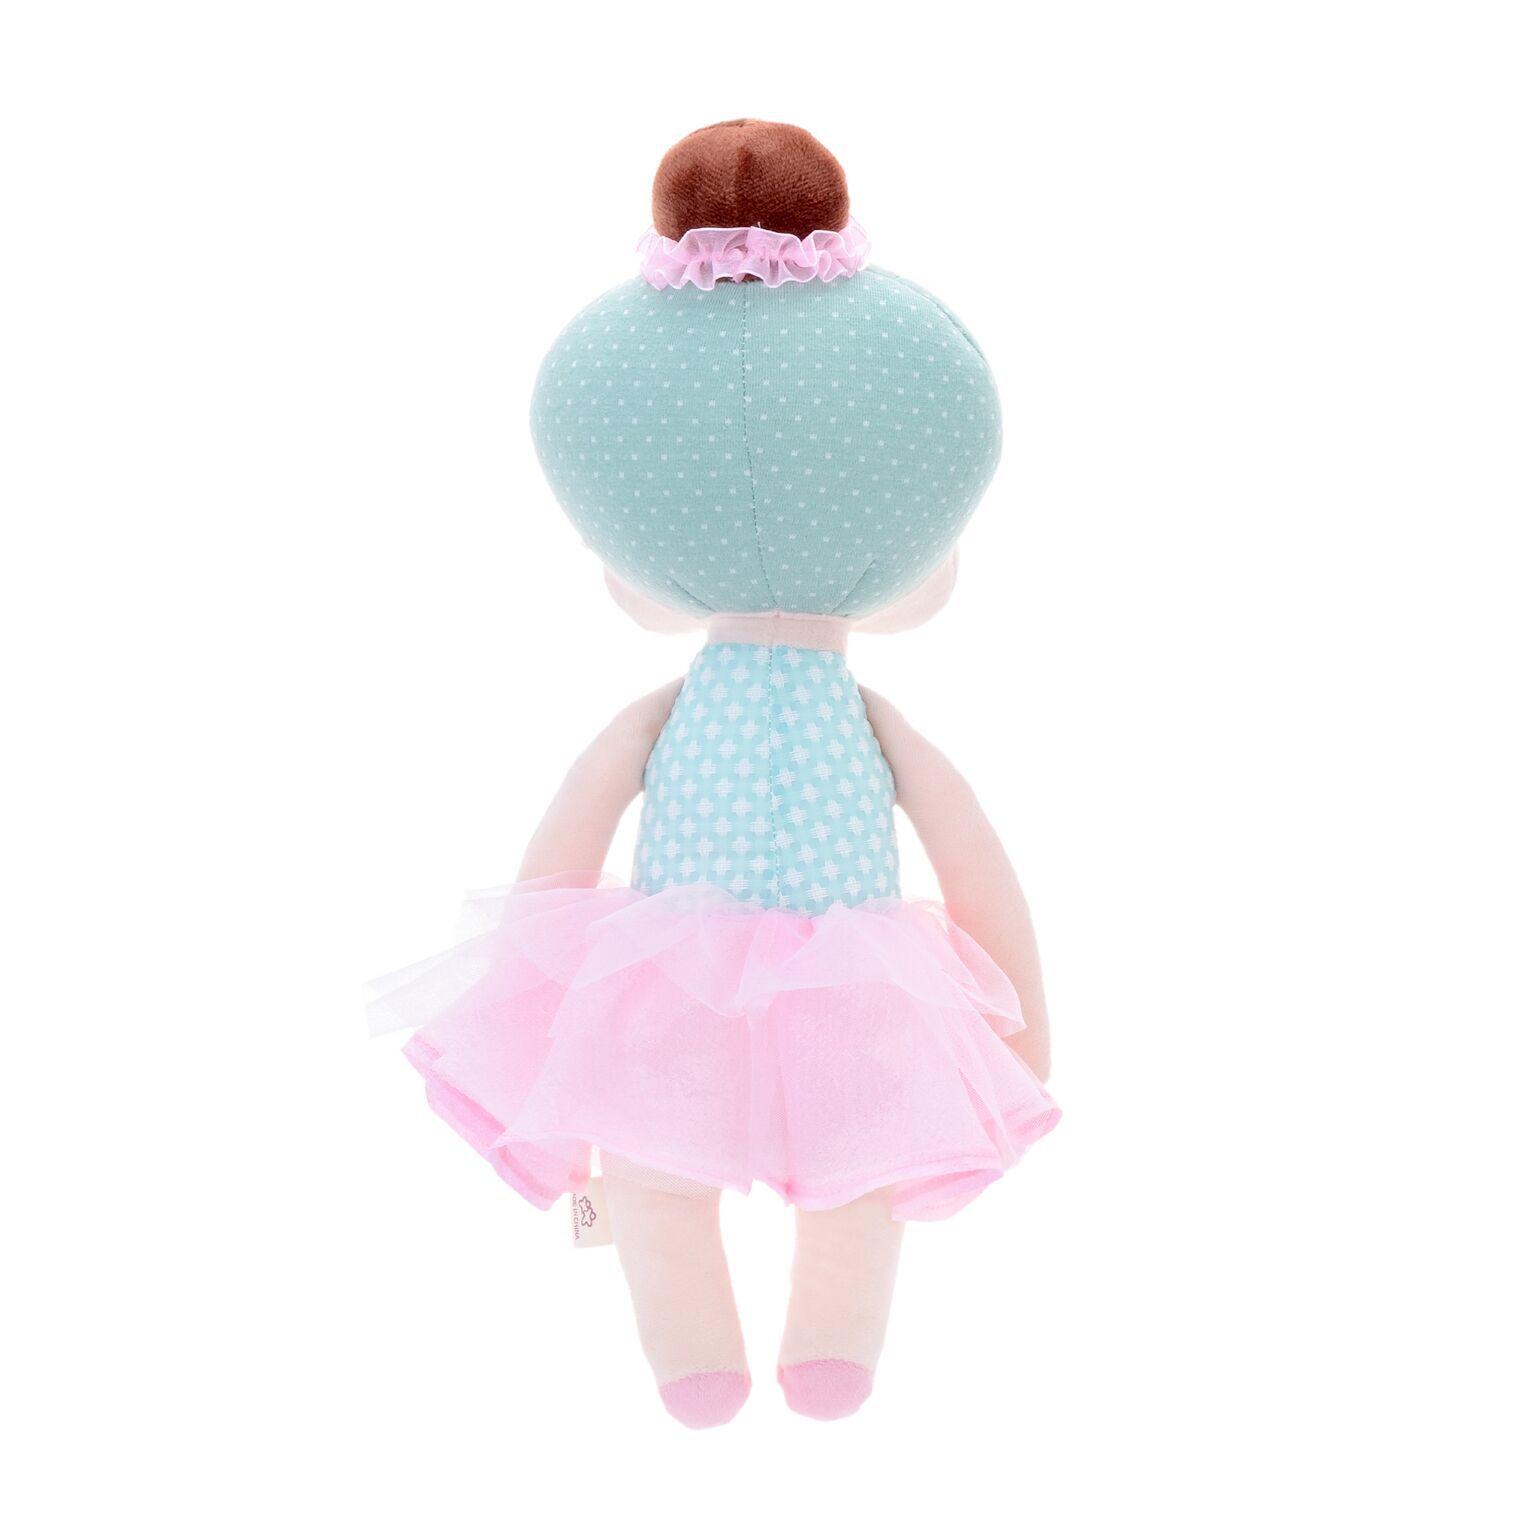 Boneca Metoo Angela Lai Ballet Original 34 cm